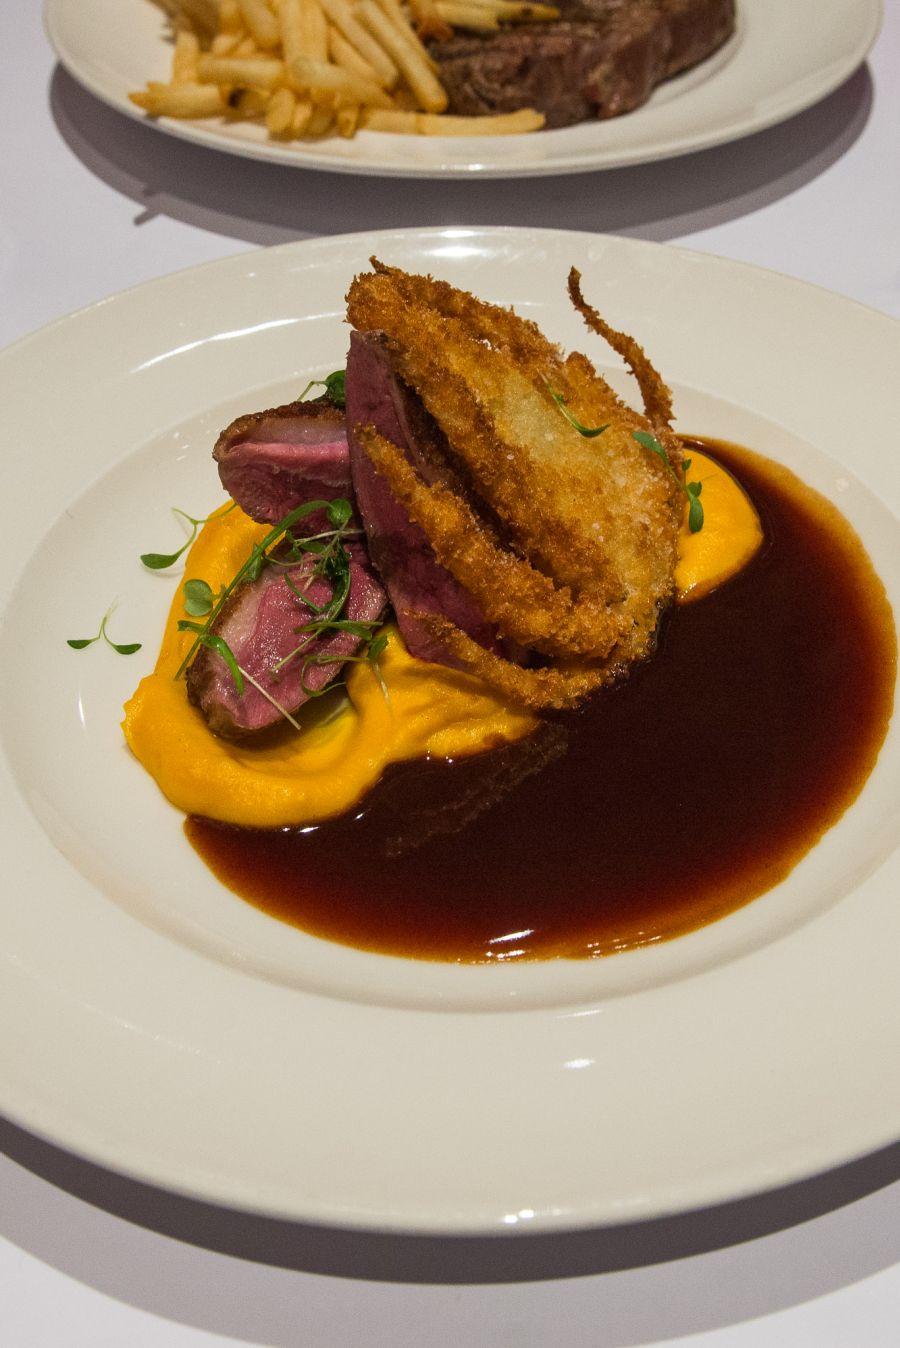 The Masterchef Australia dish: Seared duck breast, pumpkin purée, fennel crisp, Madeira jus (AU$43)